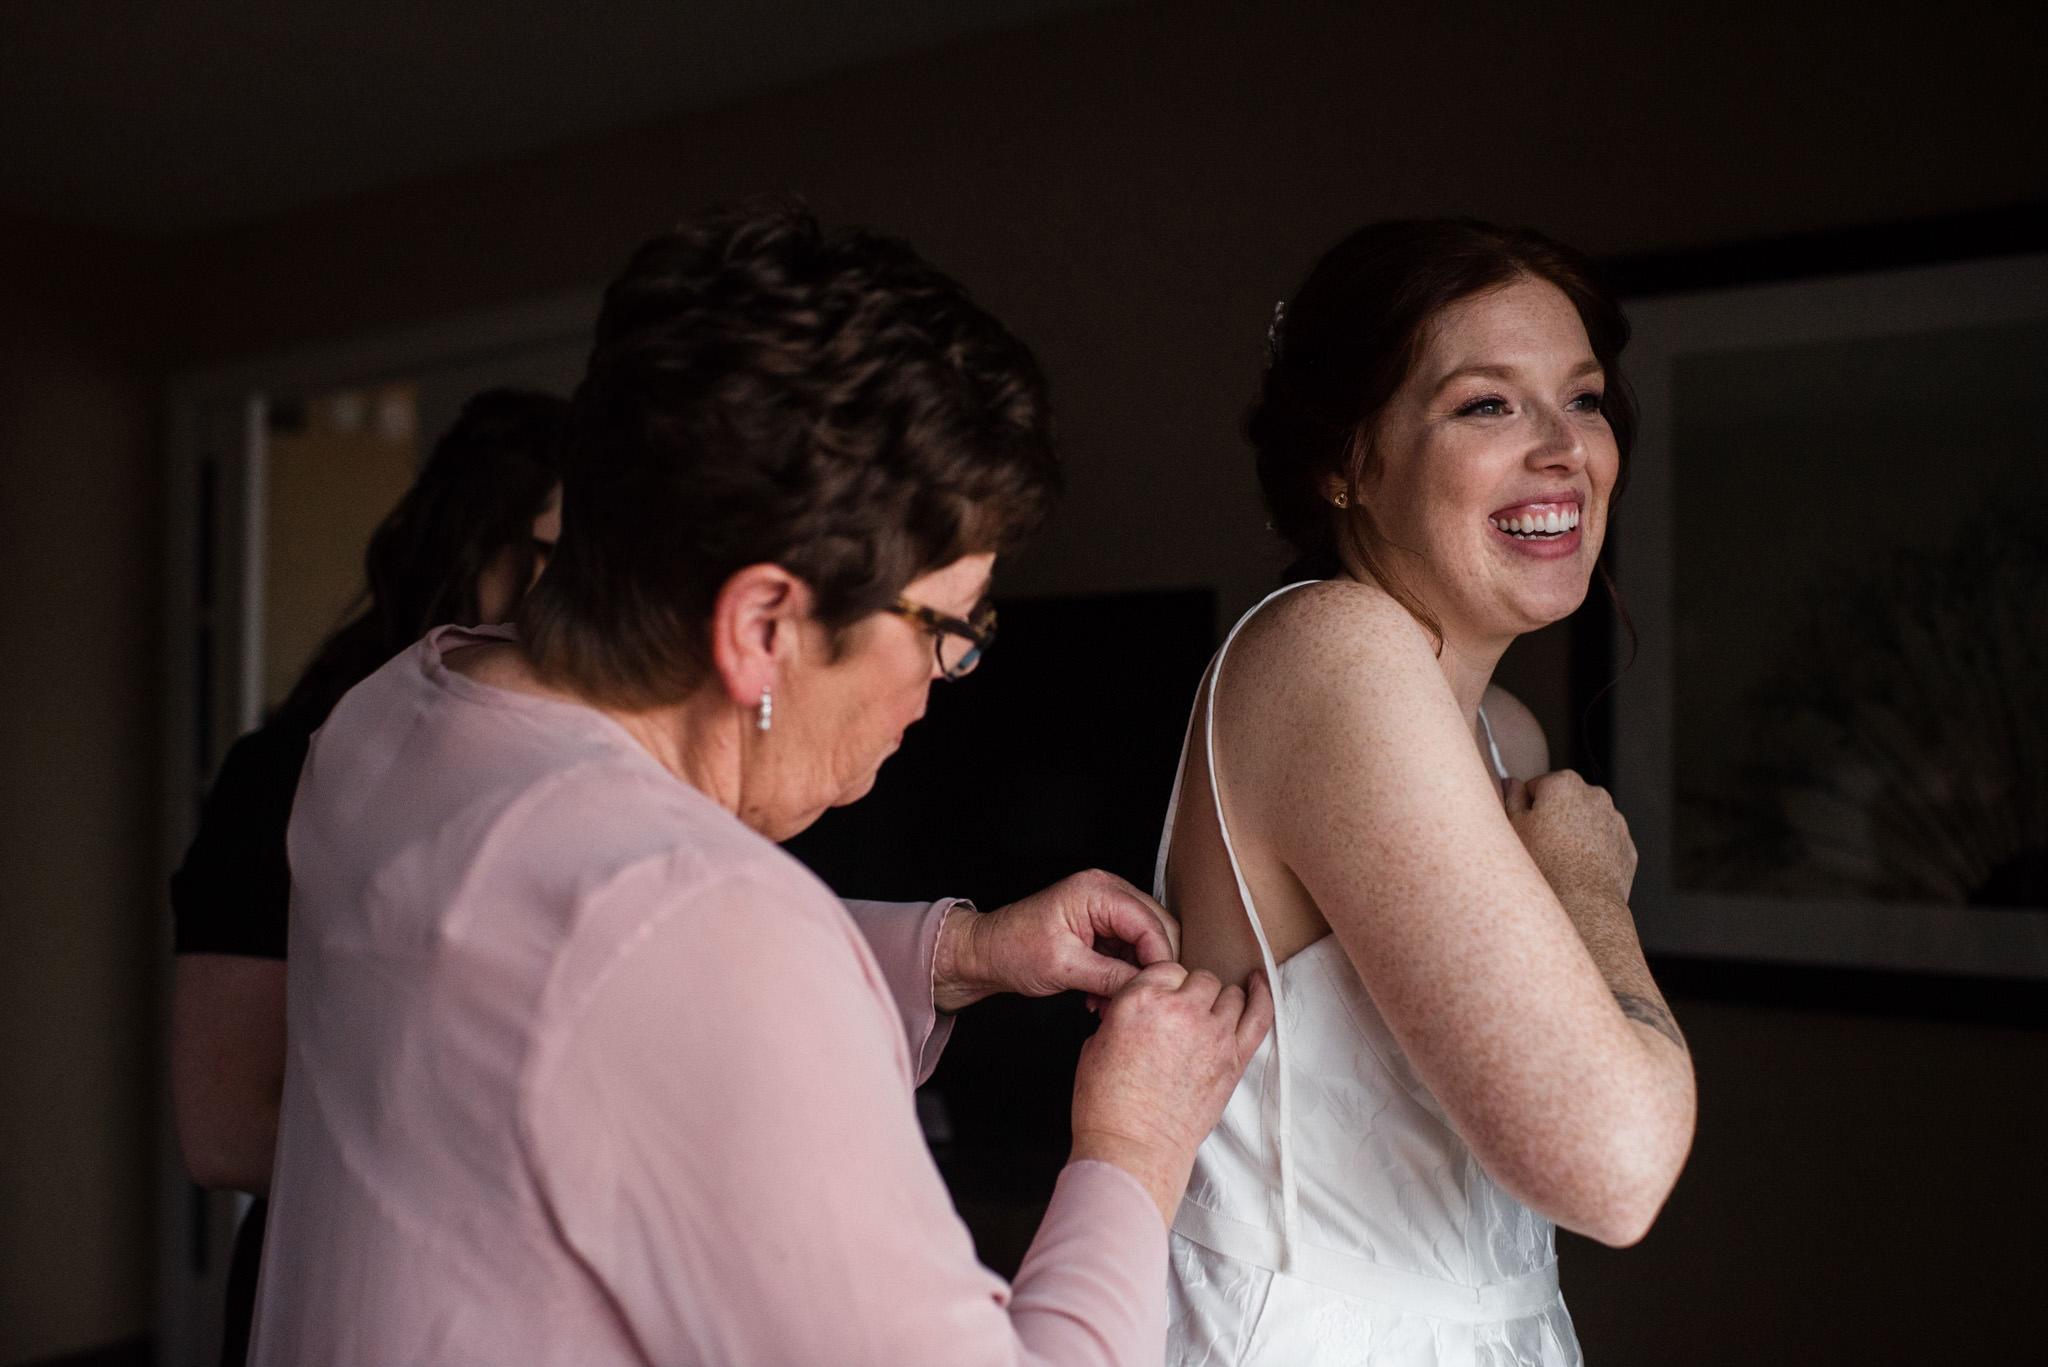 138-wedding-couple-getting-ready-toronto-hotel-rainy-day-photographer.jpg